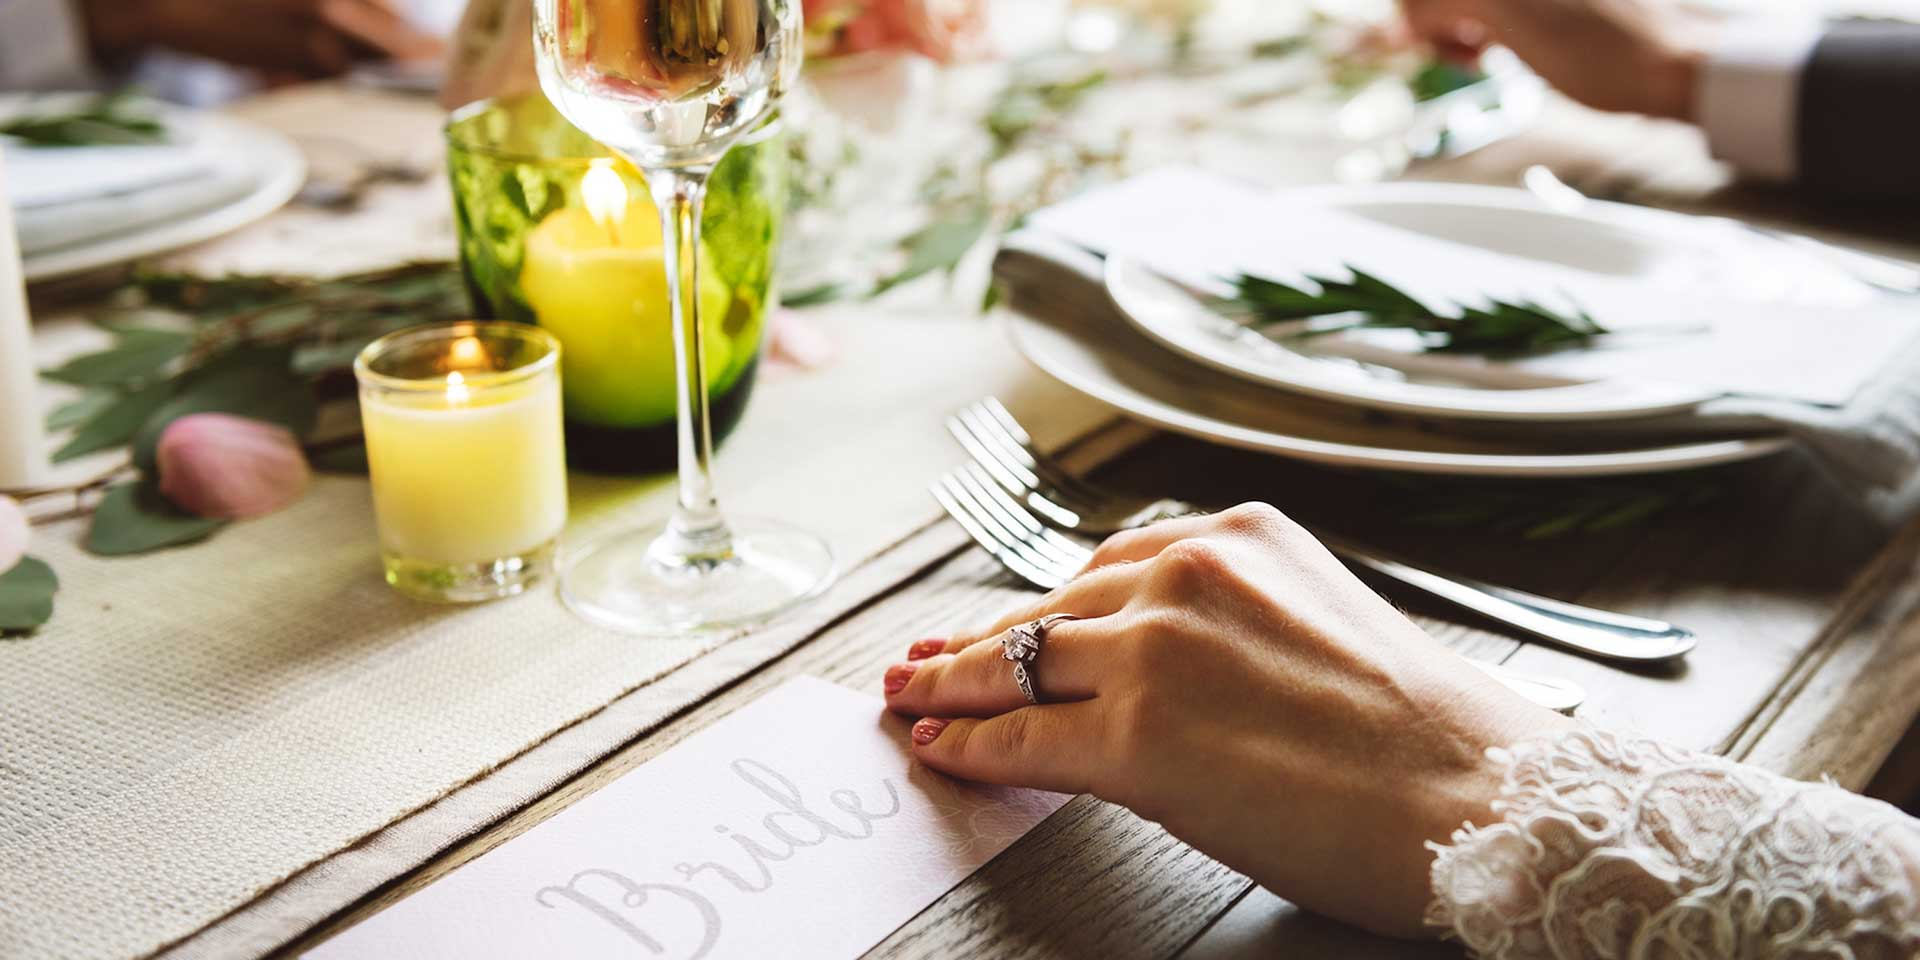 Wedding Signature Drinks.Wedding Signature Drinks Tupper Manor